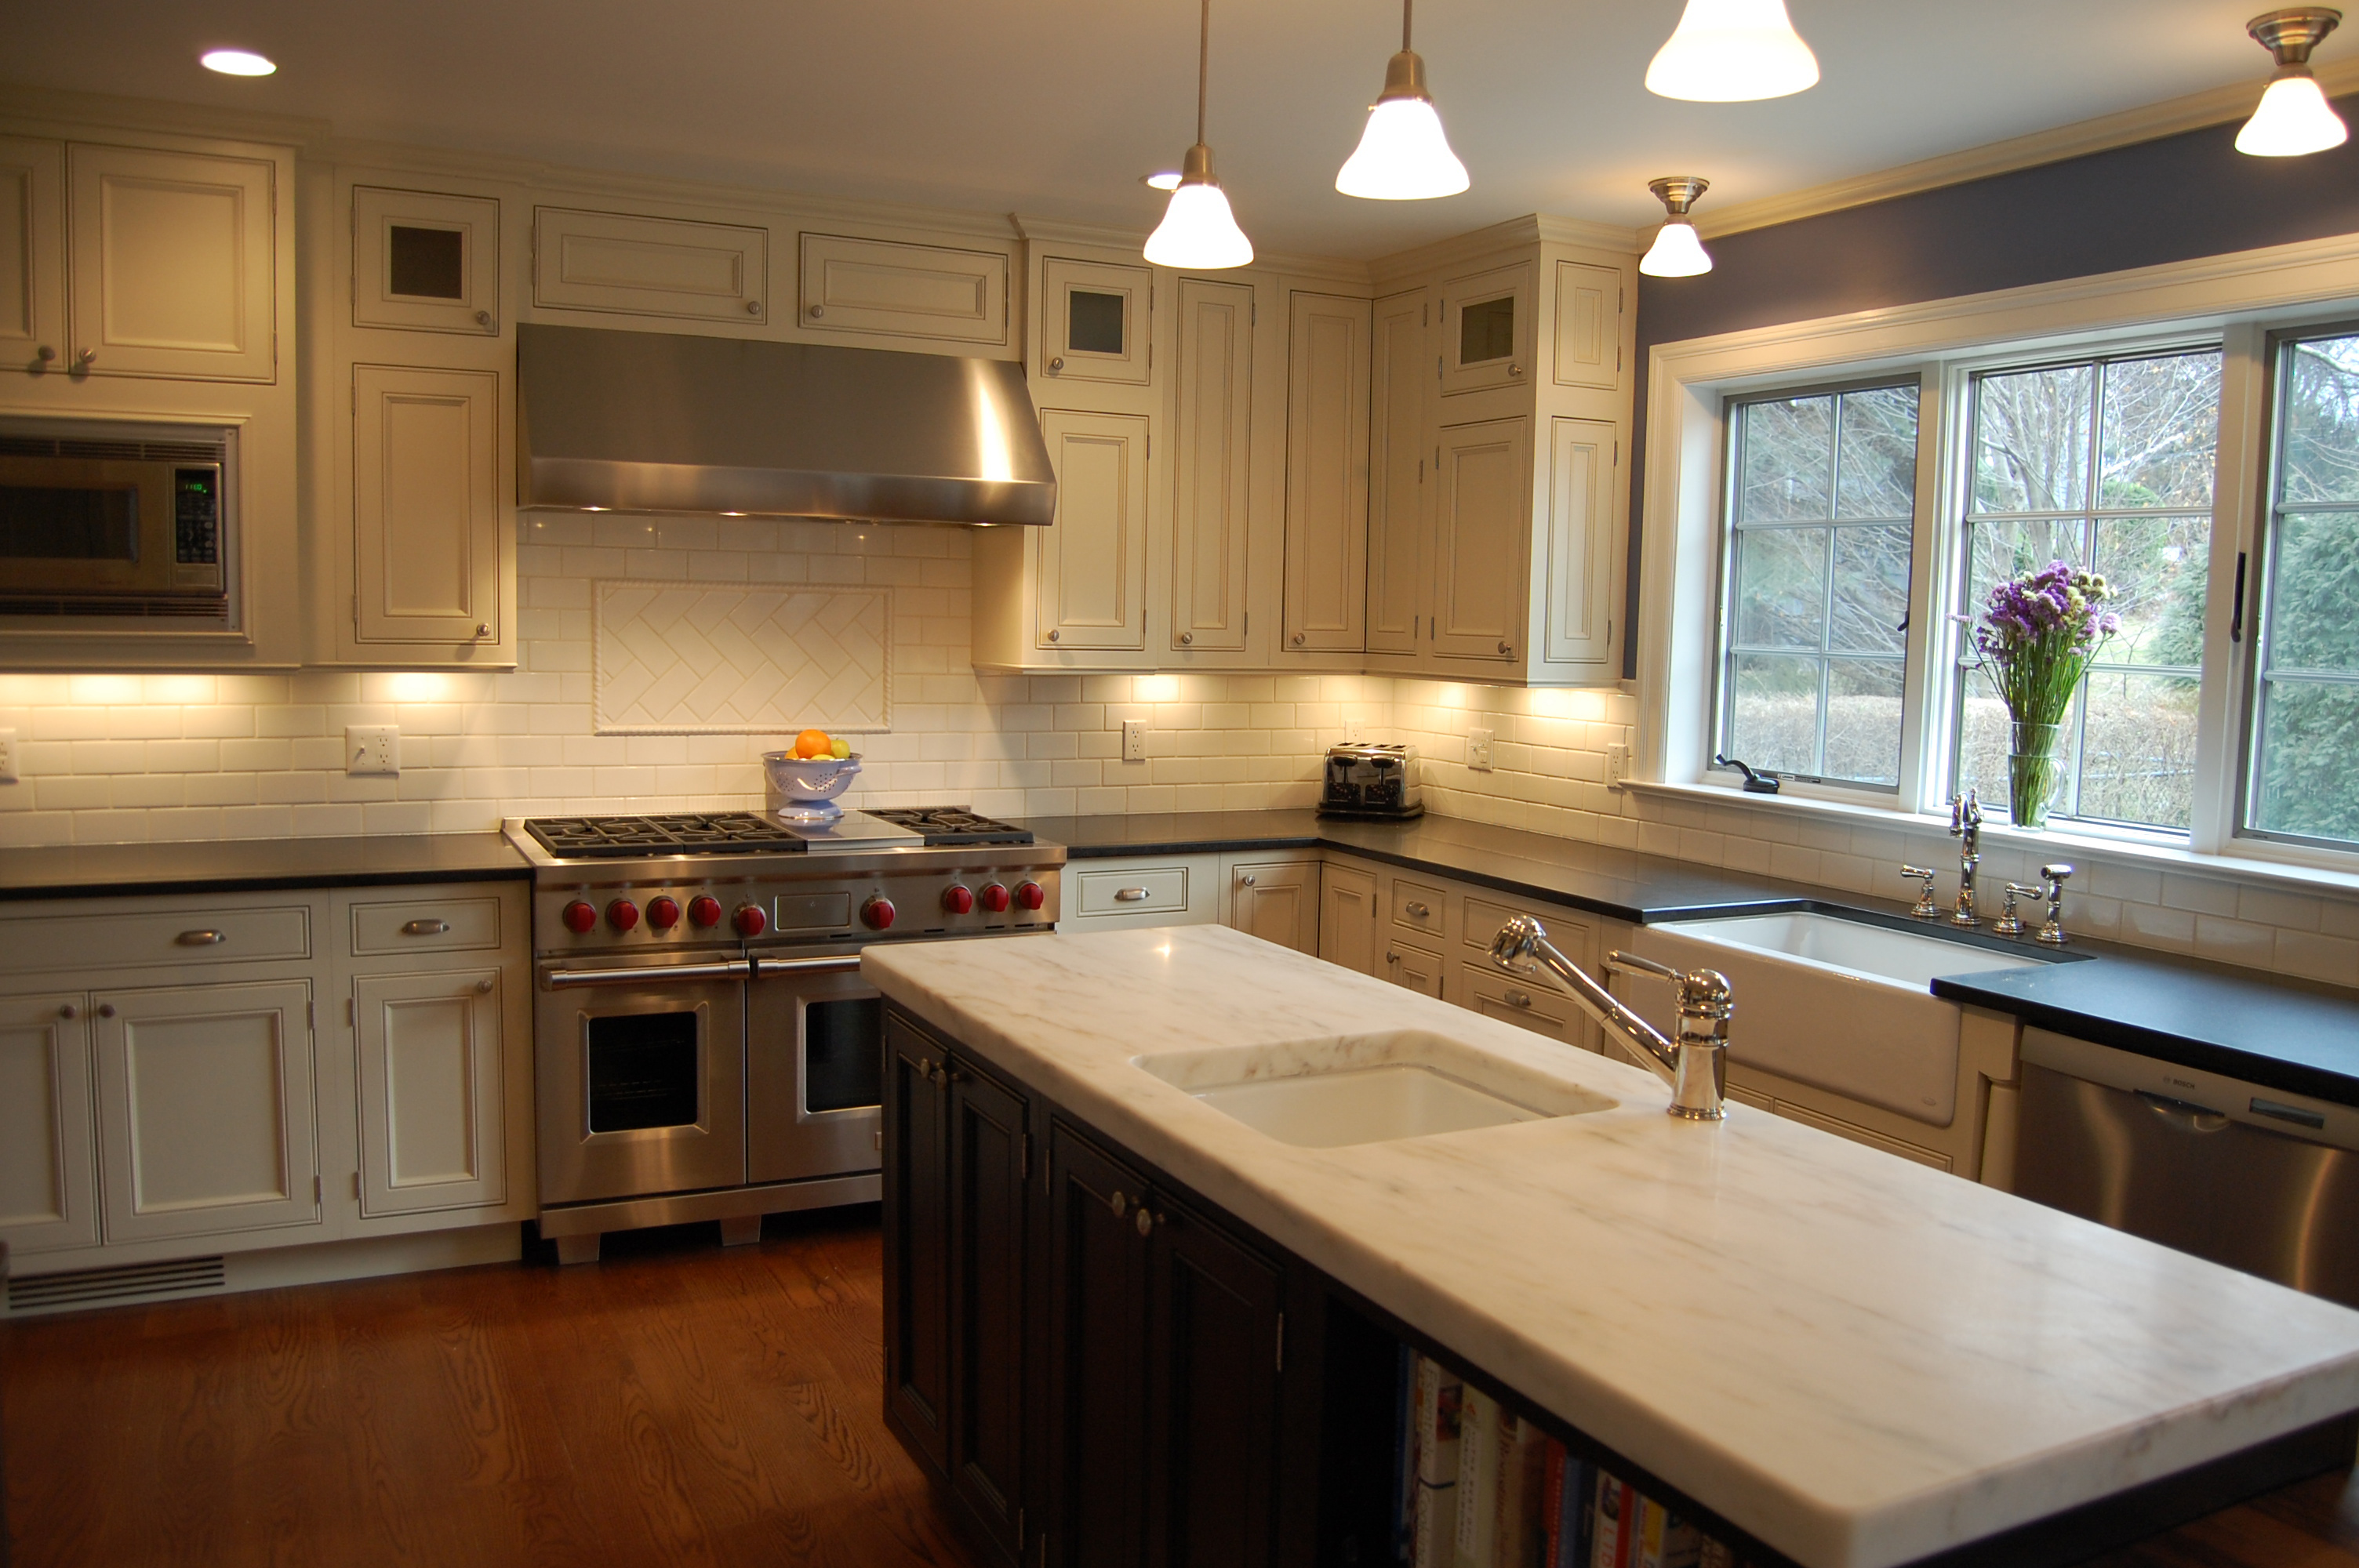 Kitchens By Frankie Larchmont Ny 10538 Angies List